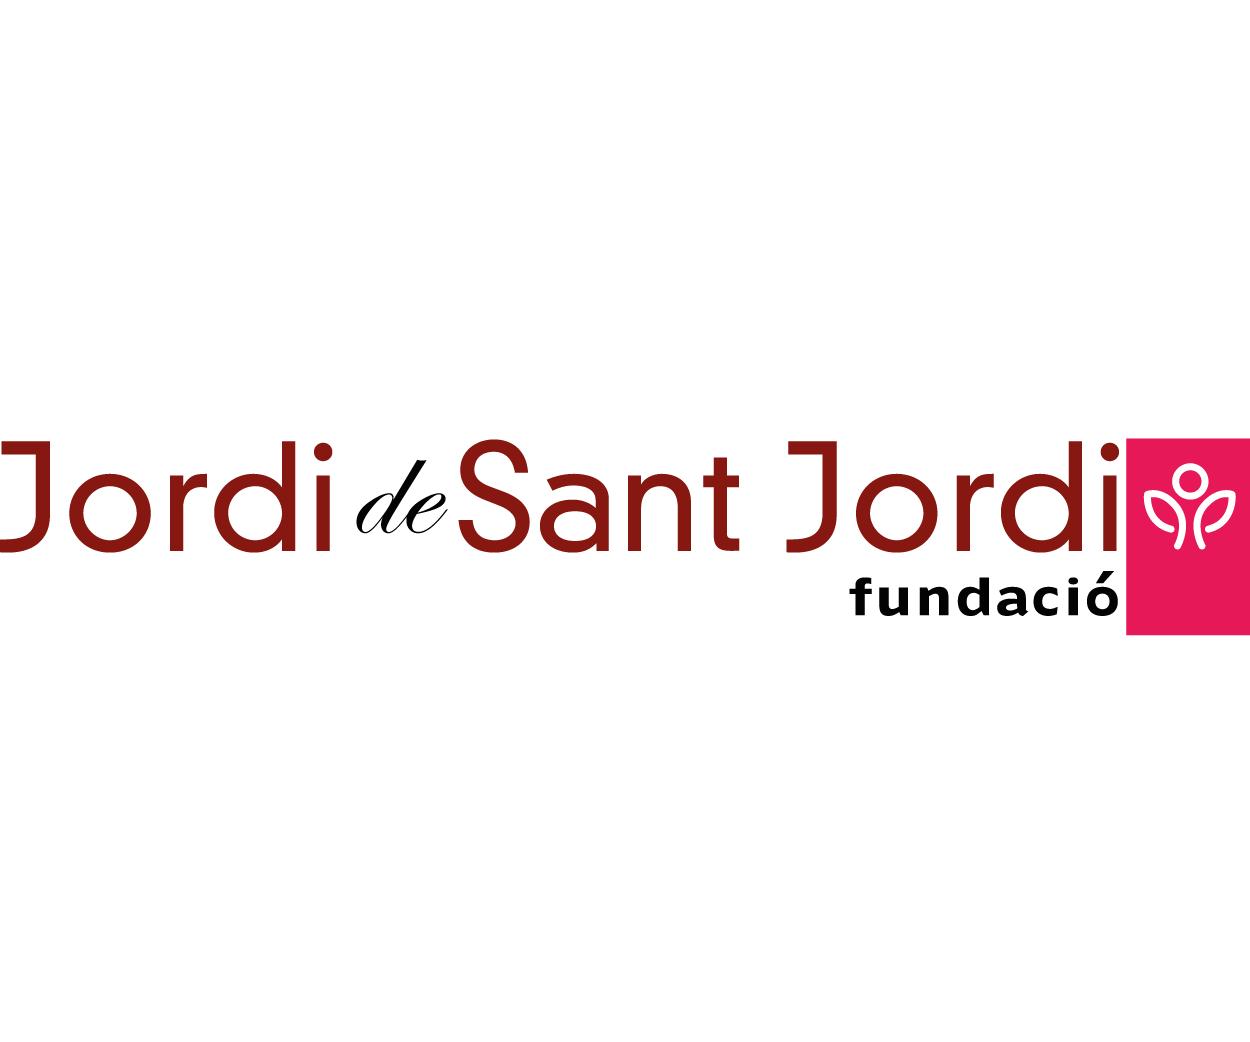 JordiSanJordi